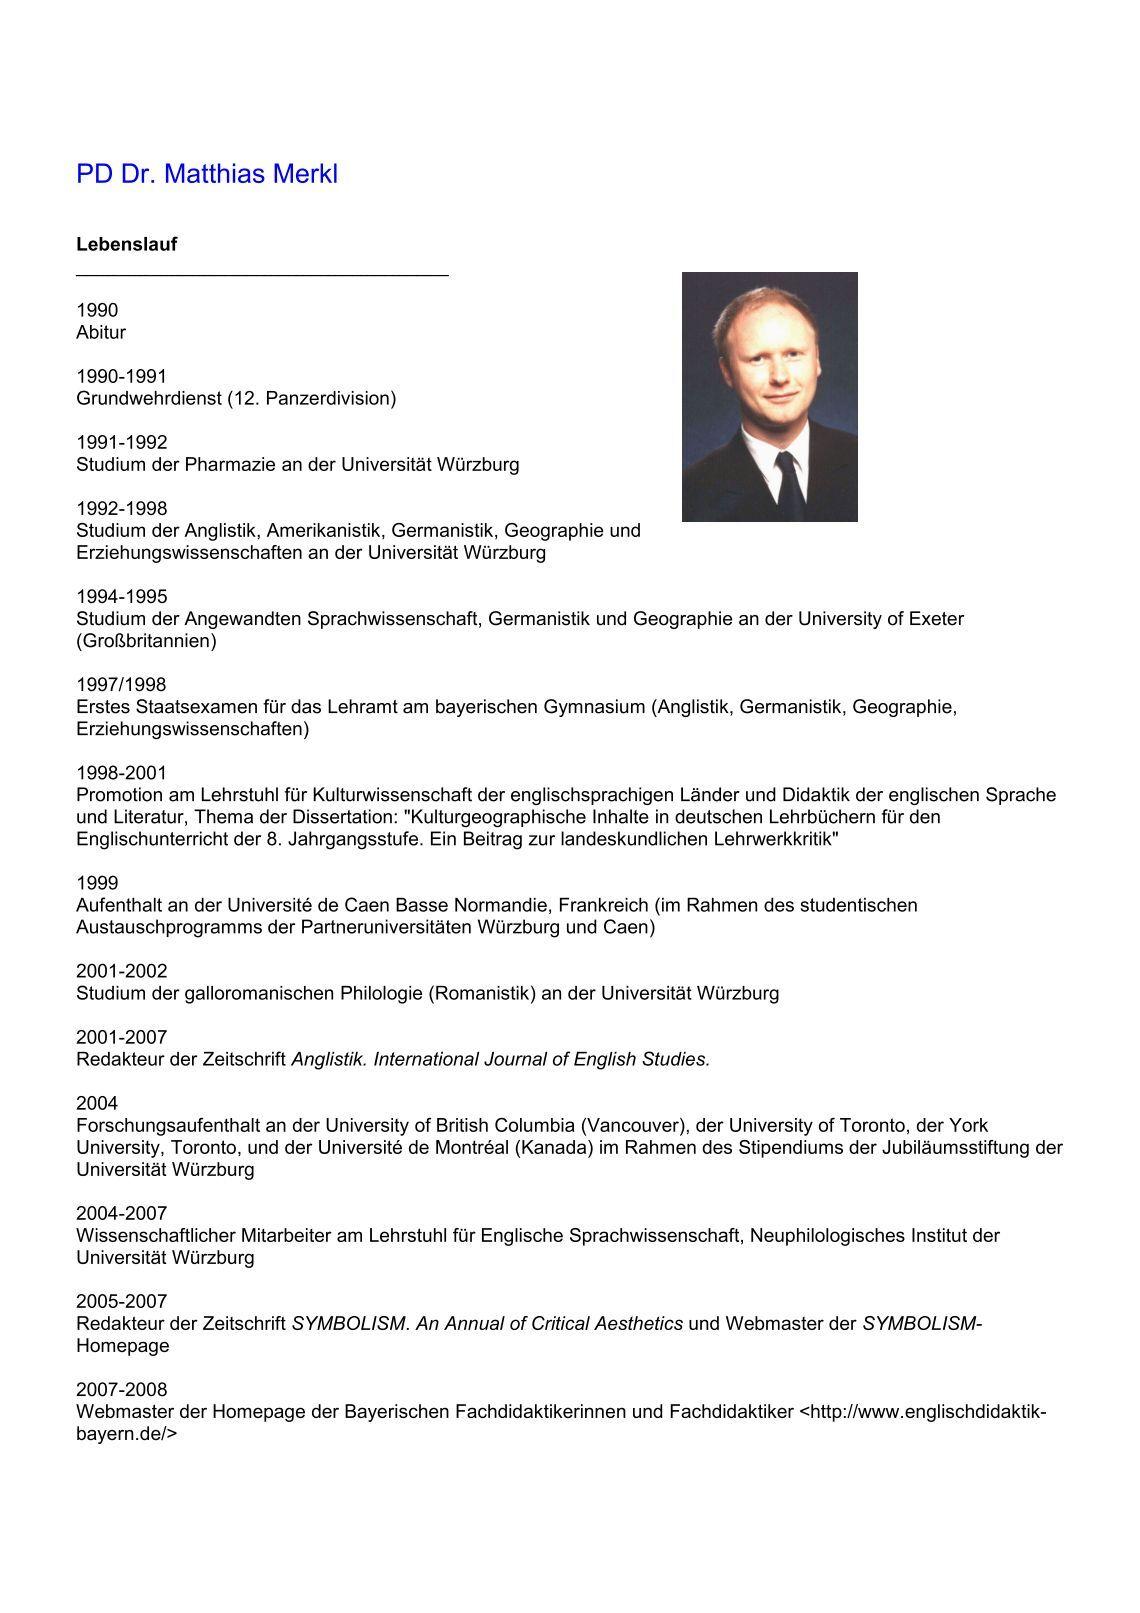 motivationsschreiben lehramt muster deckblatt bewerbung 2018